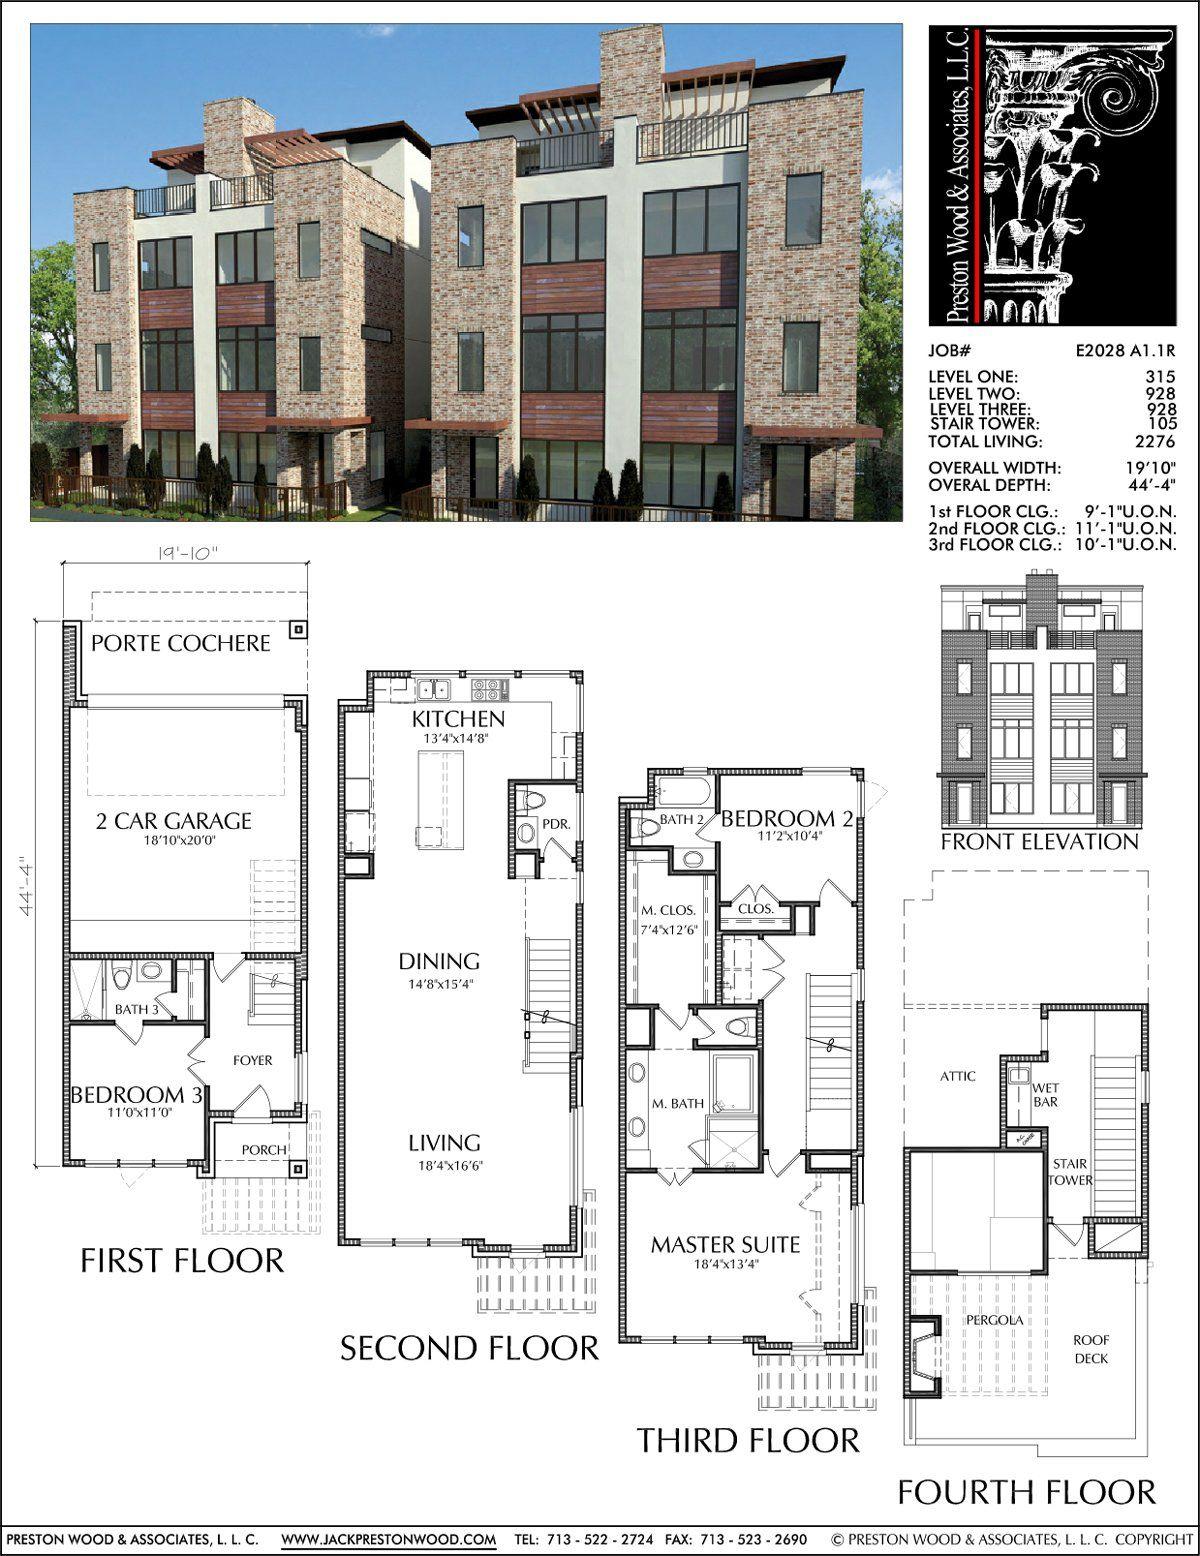 Duplex Townhomes Townhouse Floor Plans Urban Row House Plan Designer Preston Wood Associates Town House Plans Family House Plans House Floor Plans